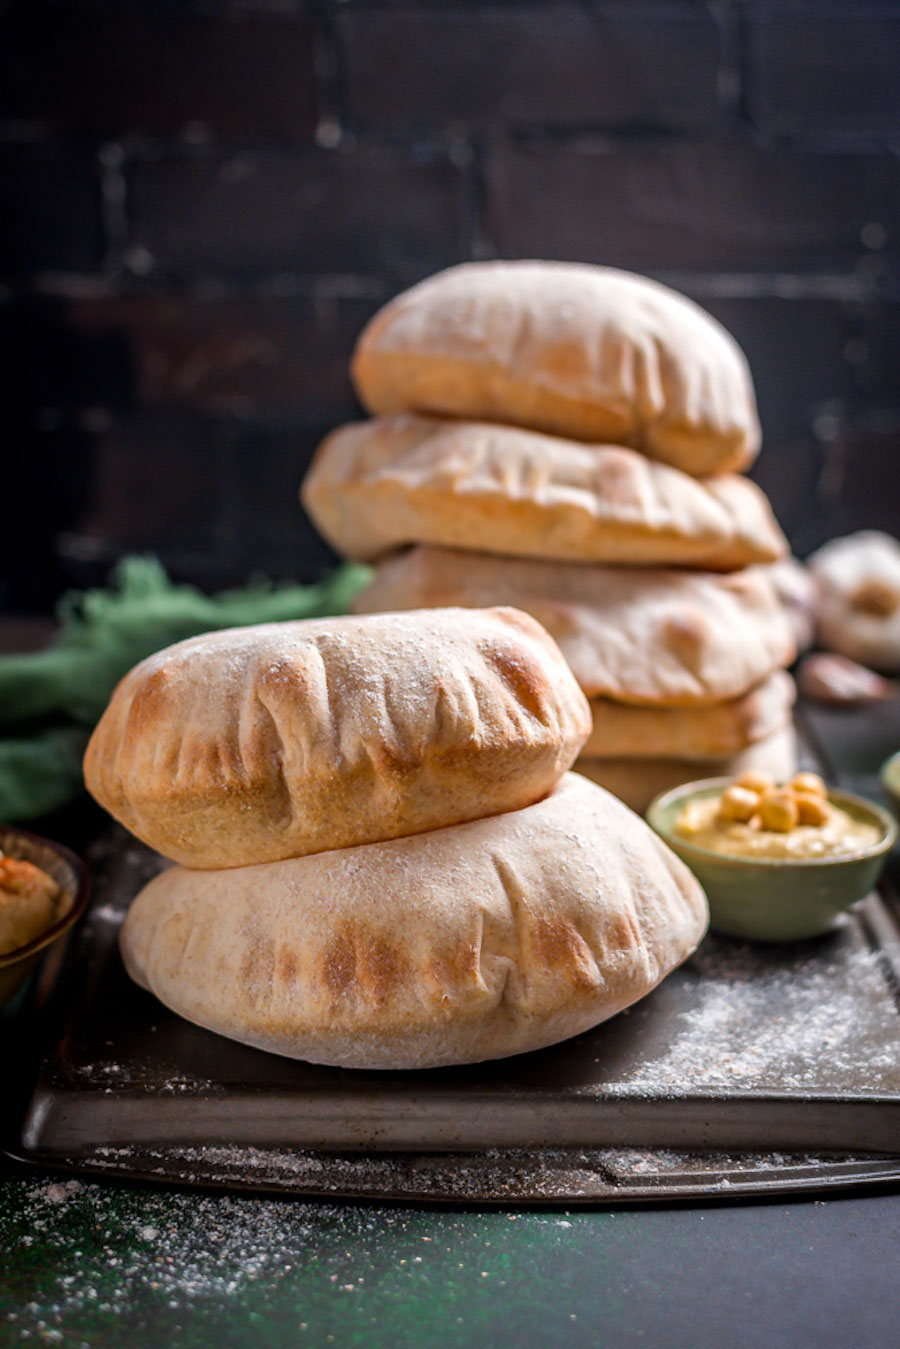 pita maken - pita broodjes maken - pita brood bakken - pita brood recepten